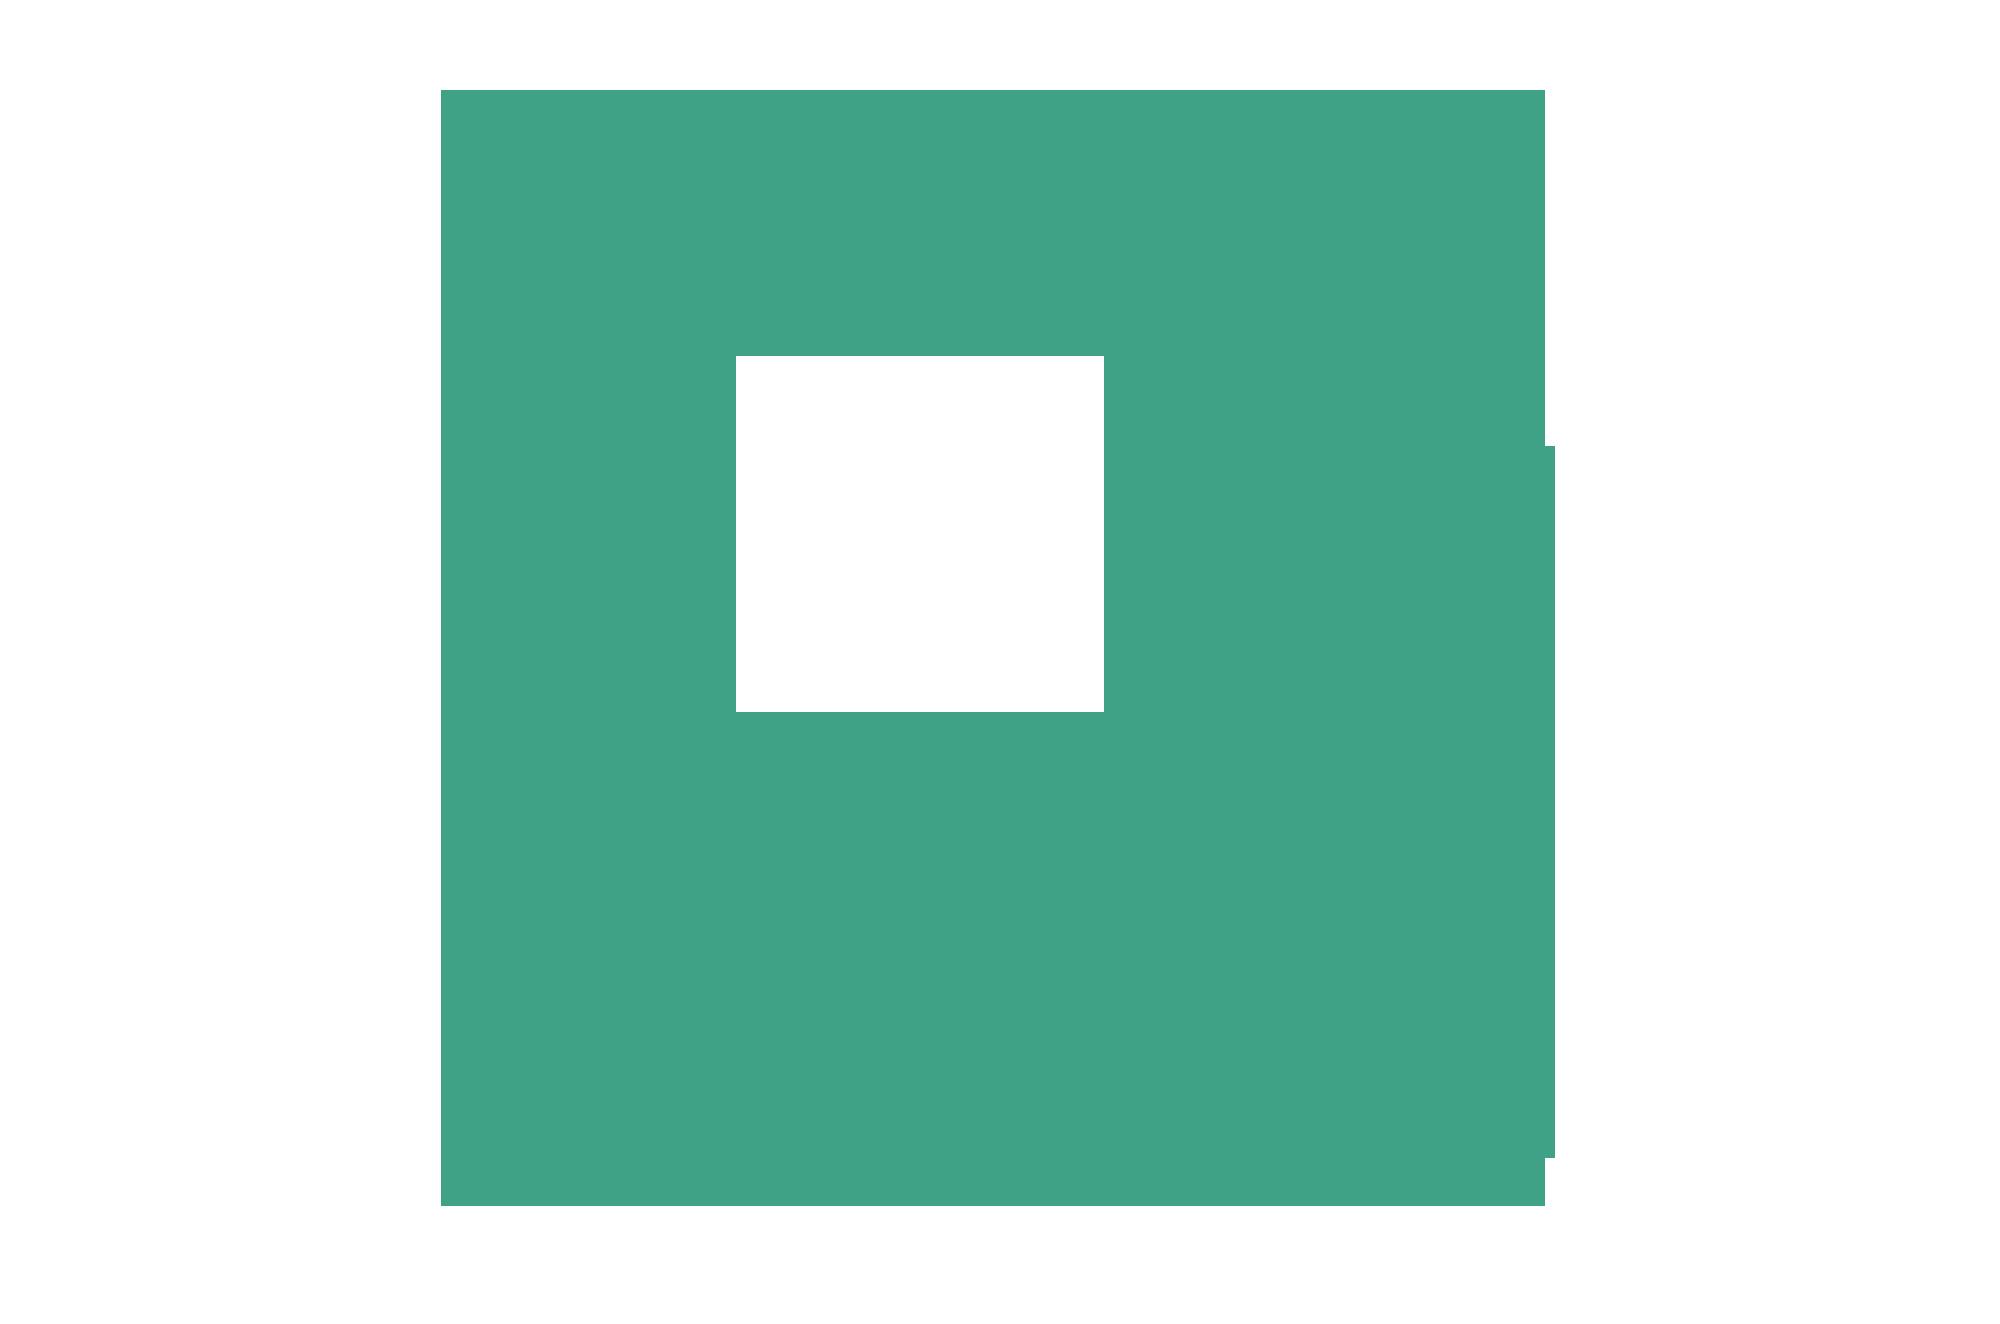 O2 Exercise colour emblem for website.png